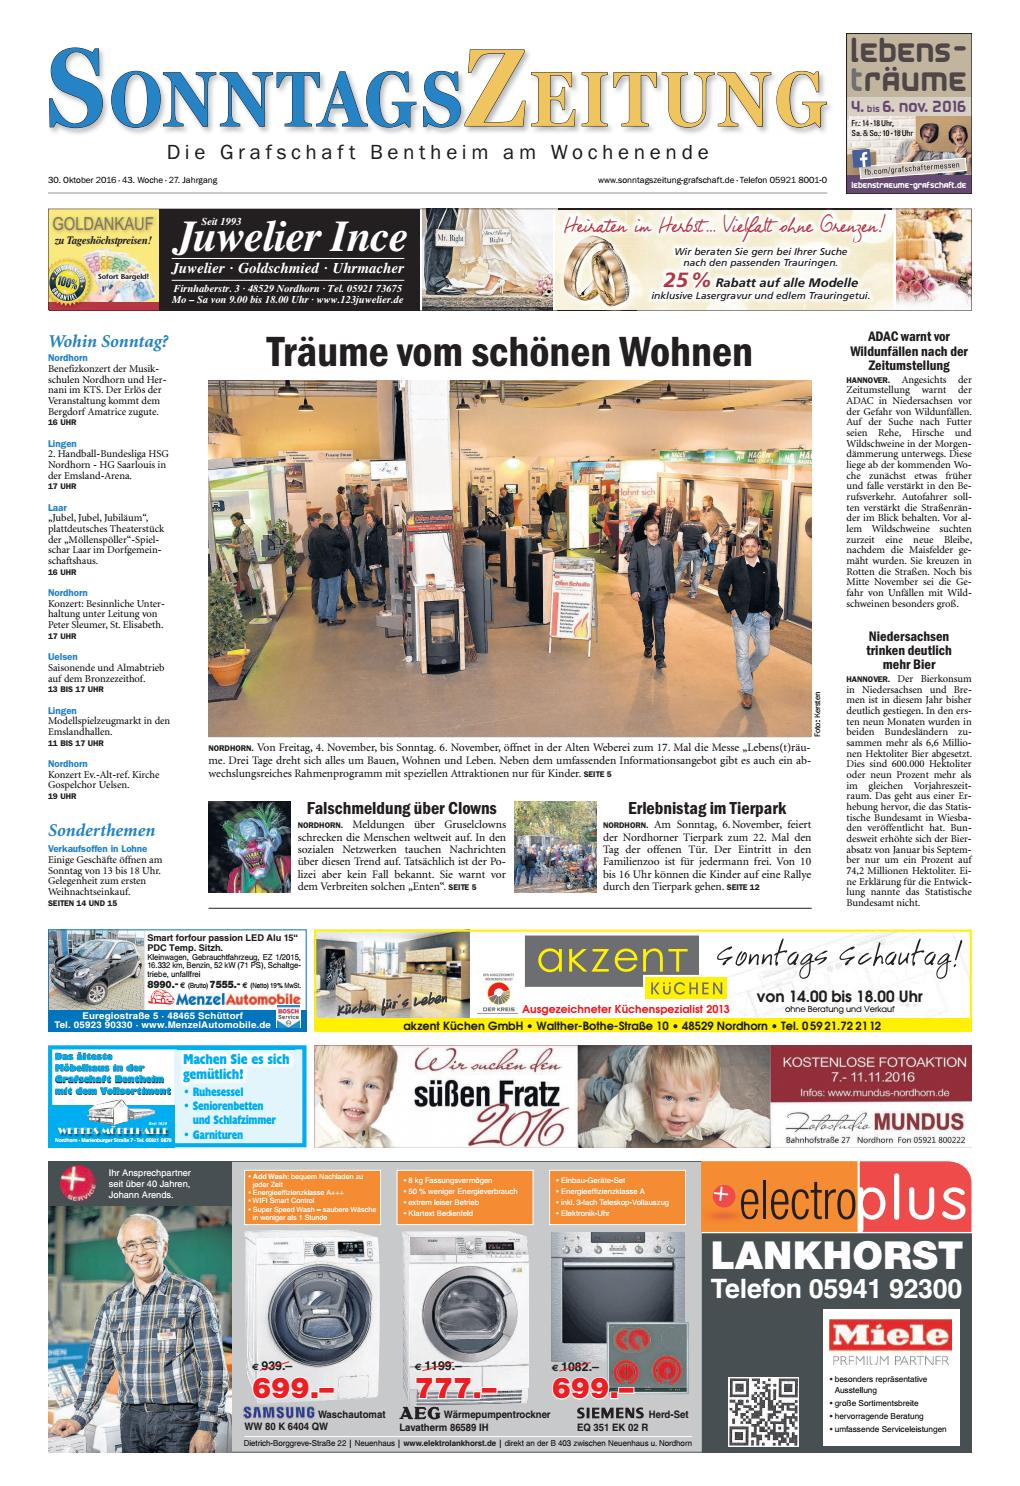 sonntagszeitung 30 10 2016 by